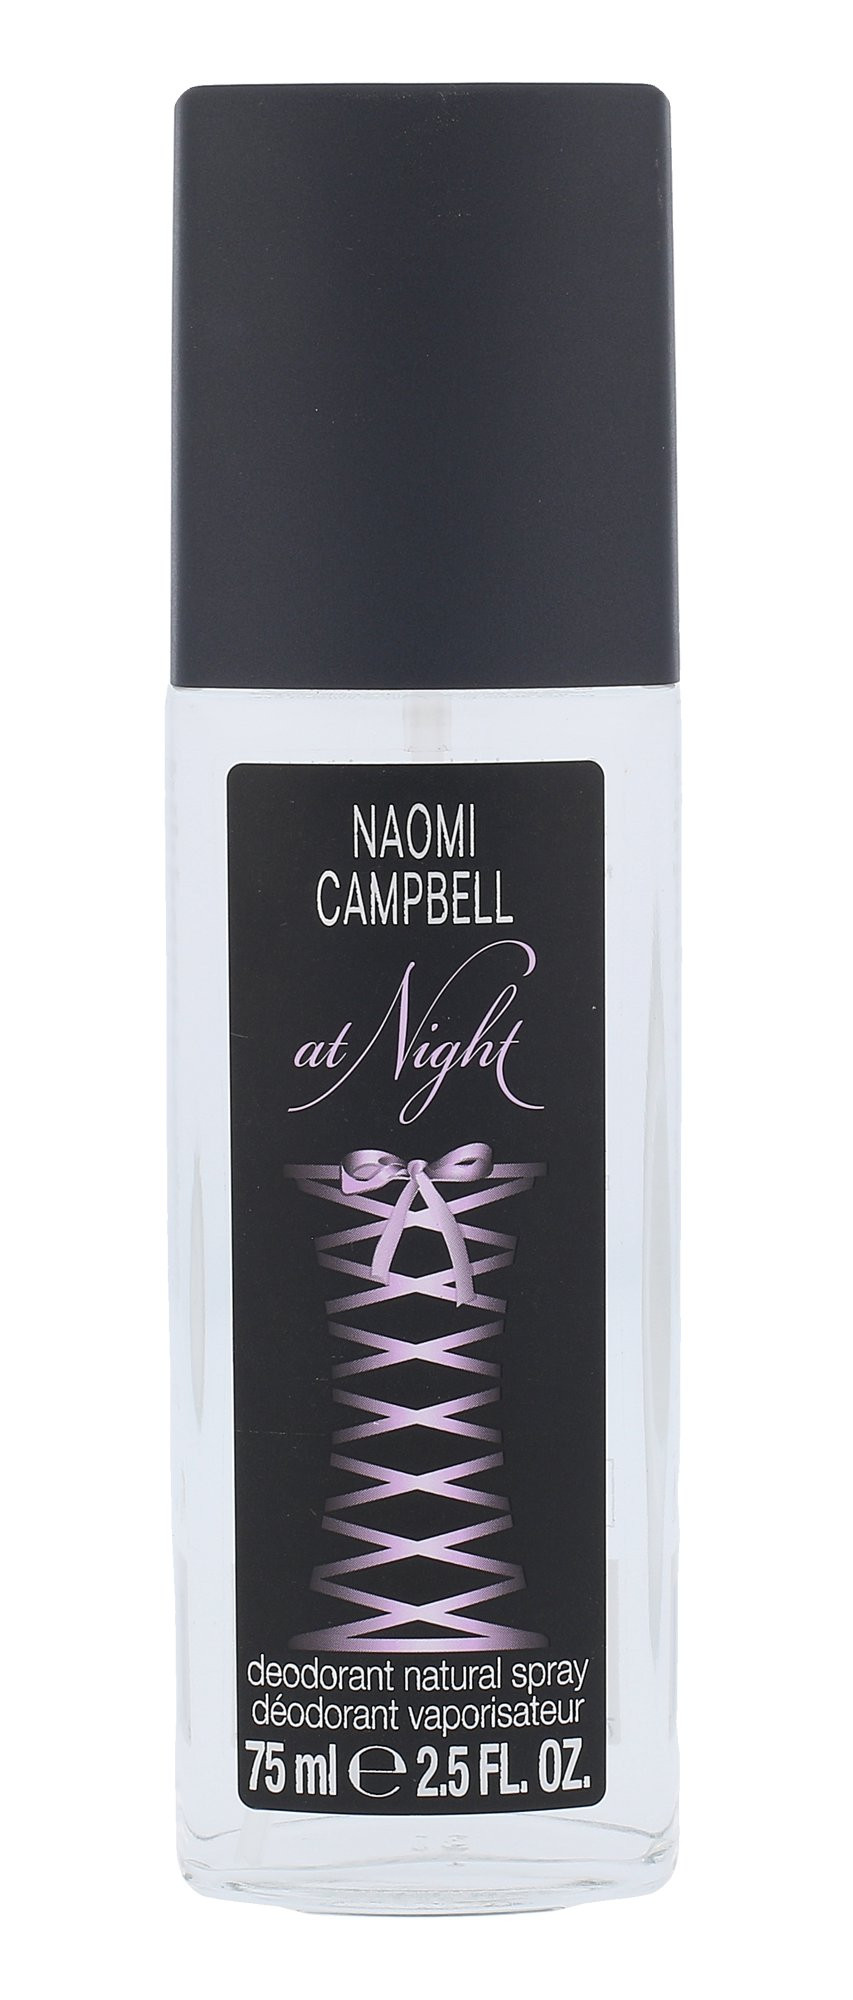 Naomi Campbell At Night, 75ml, Deodorant